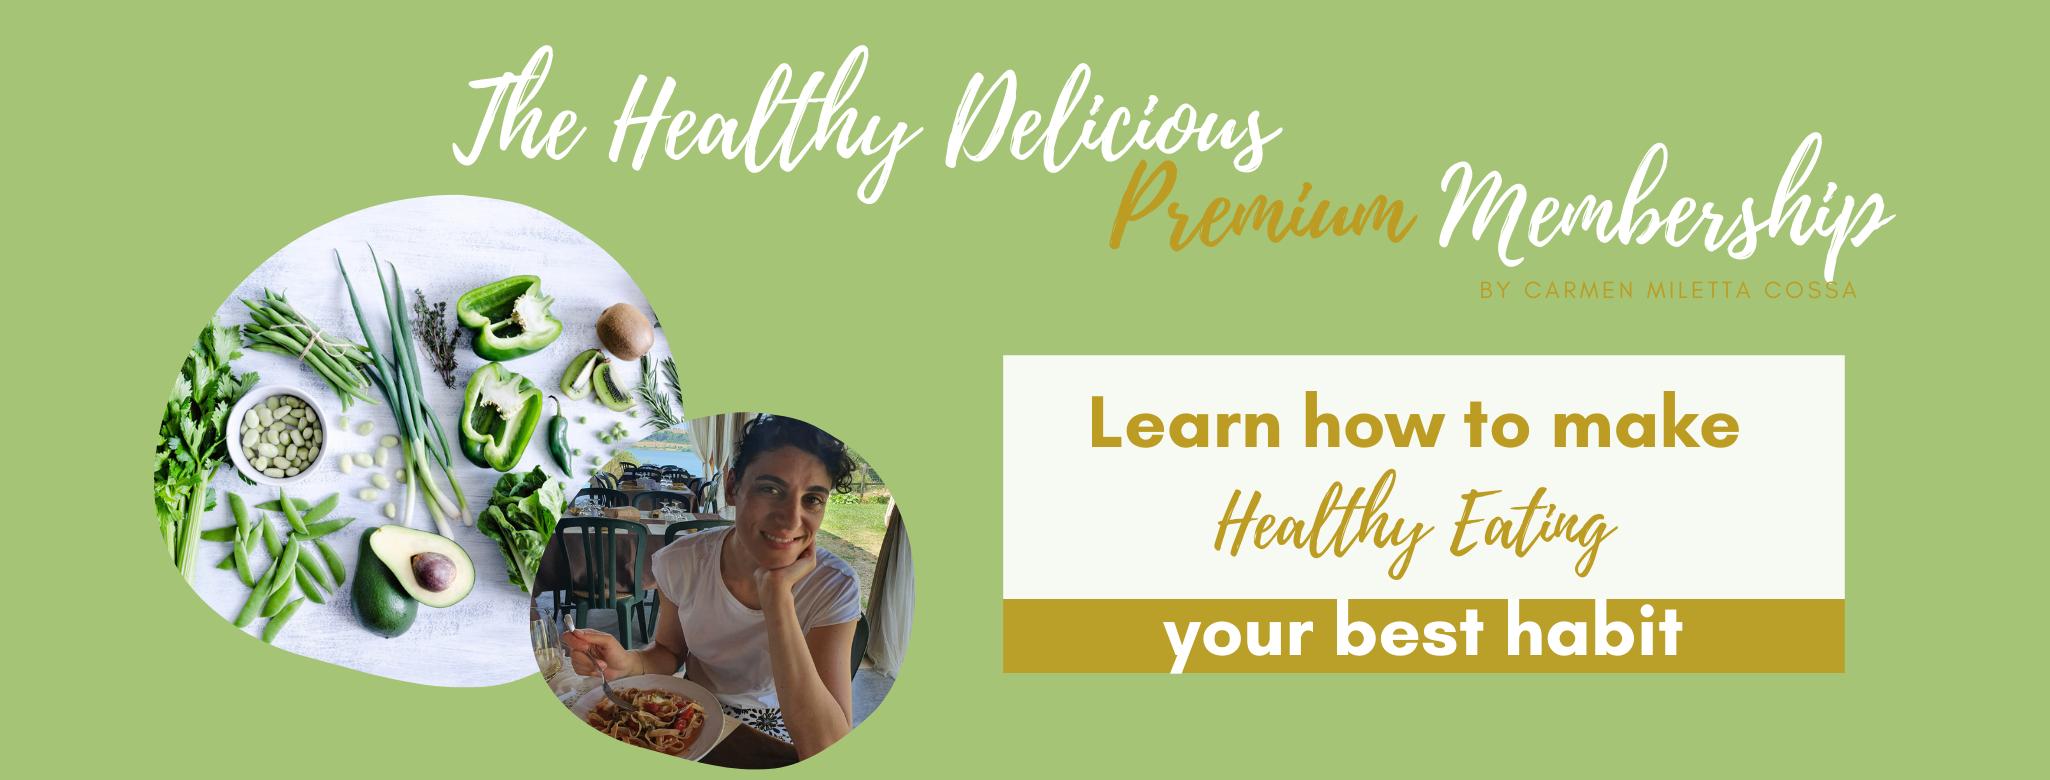 The Healthy Delicious Premium Membership